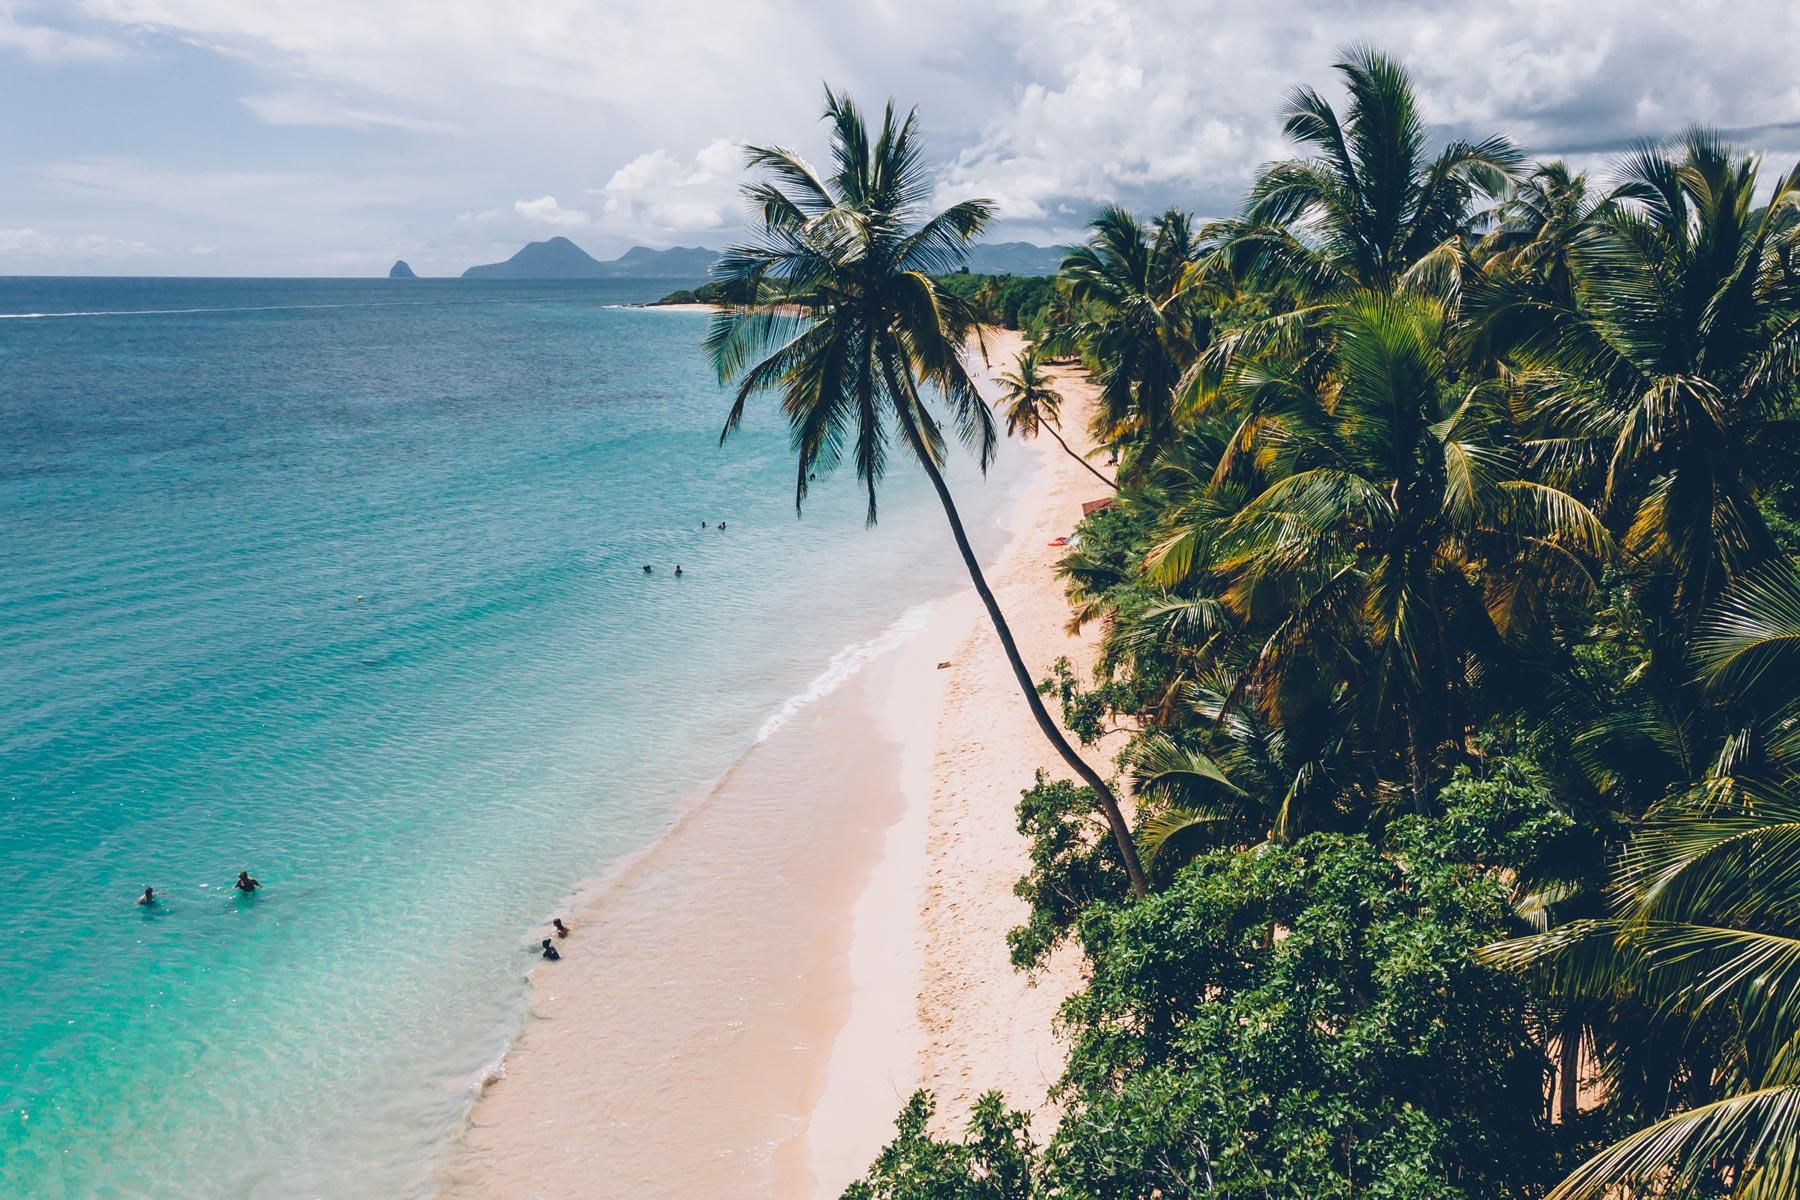 Plage Martinique Grande Anse des Salines